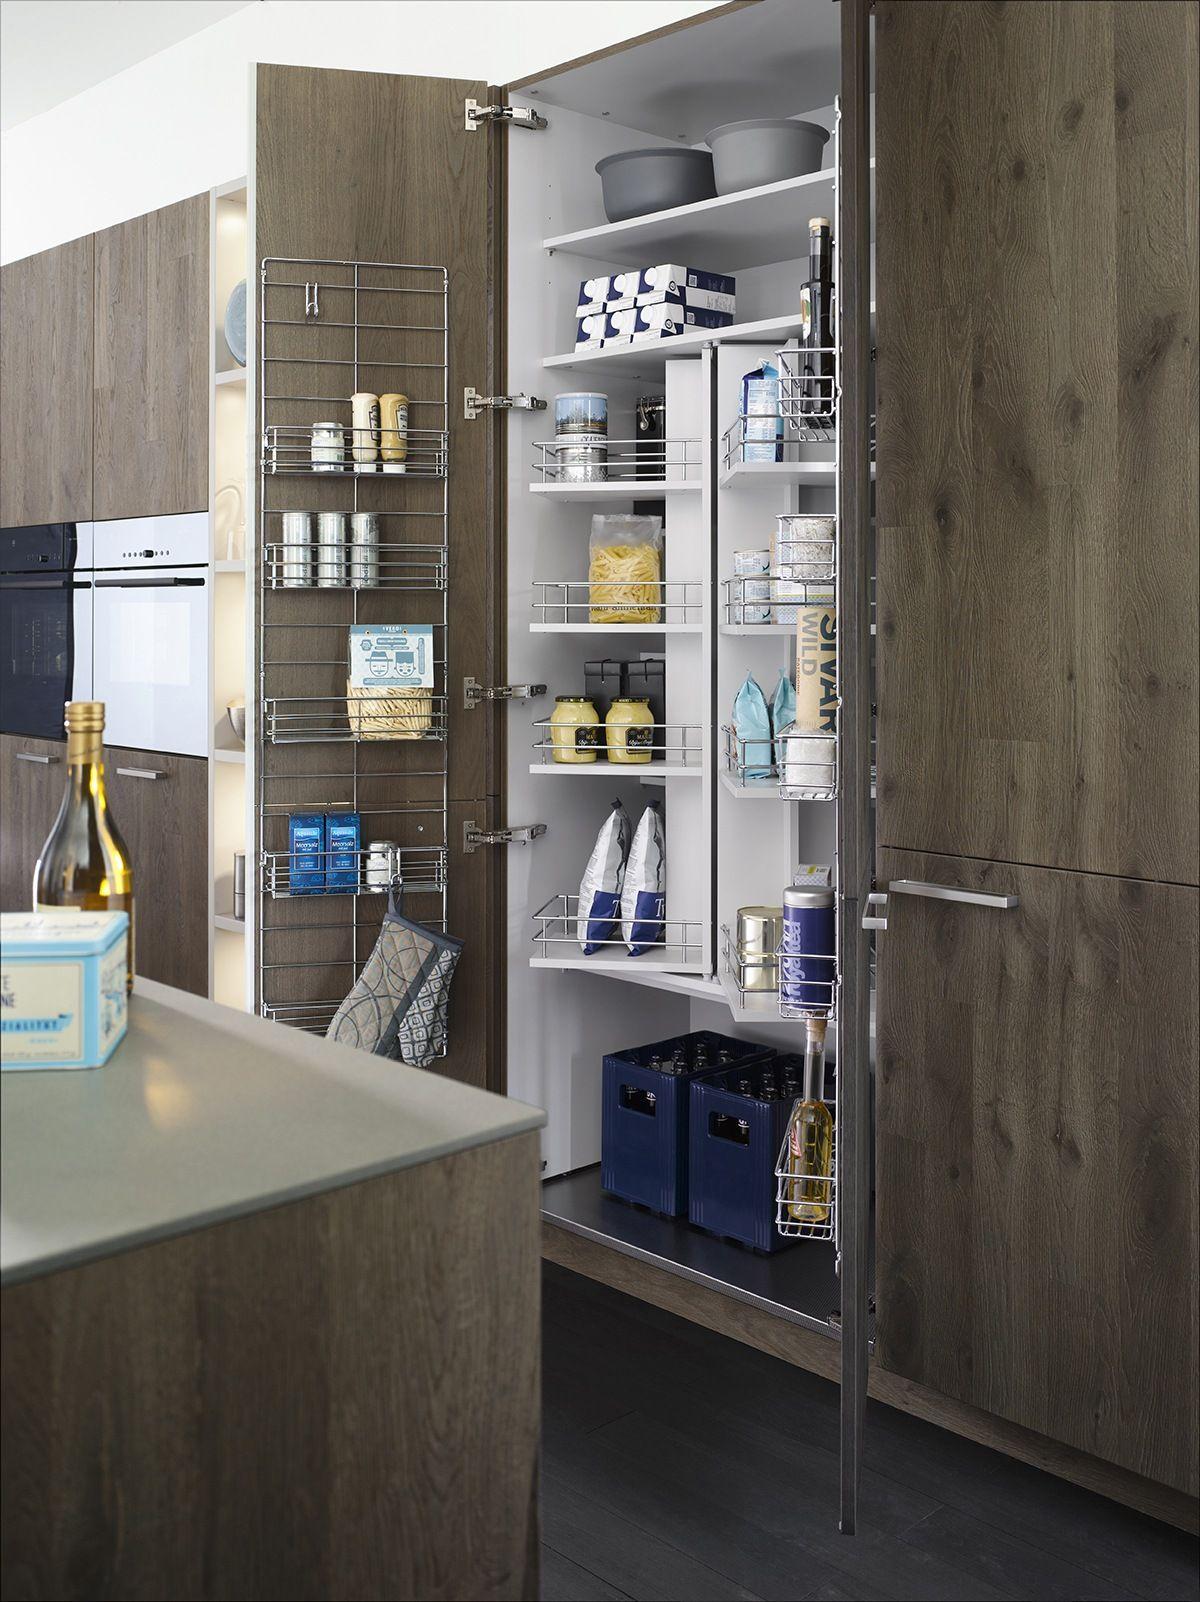 Tall Cabinets Kitchen Remodel Design Modern Kitchen Design Interior Design Kitchen